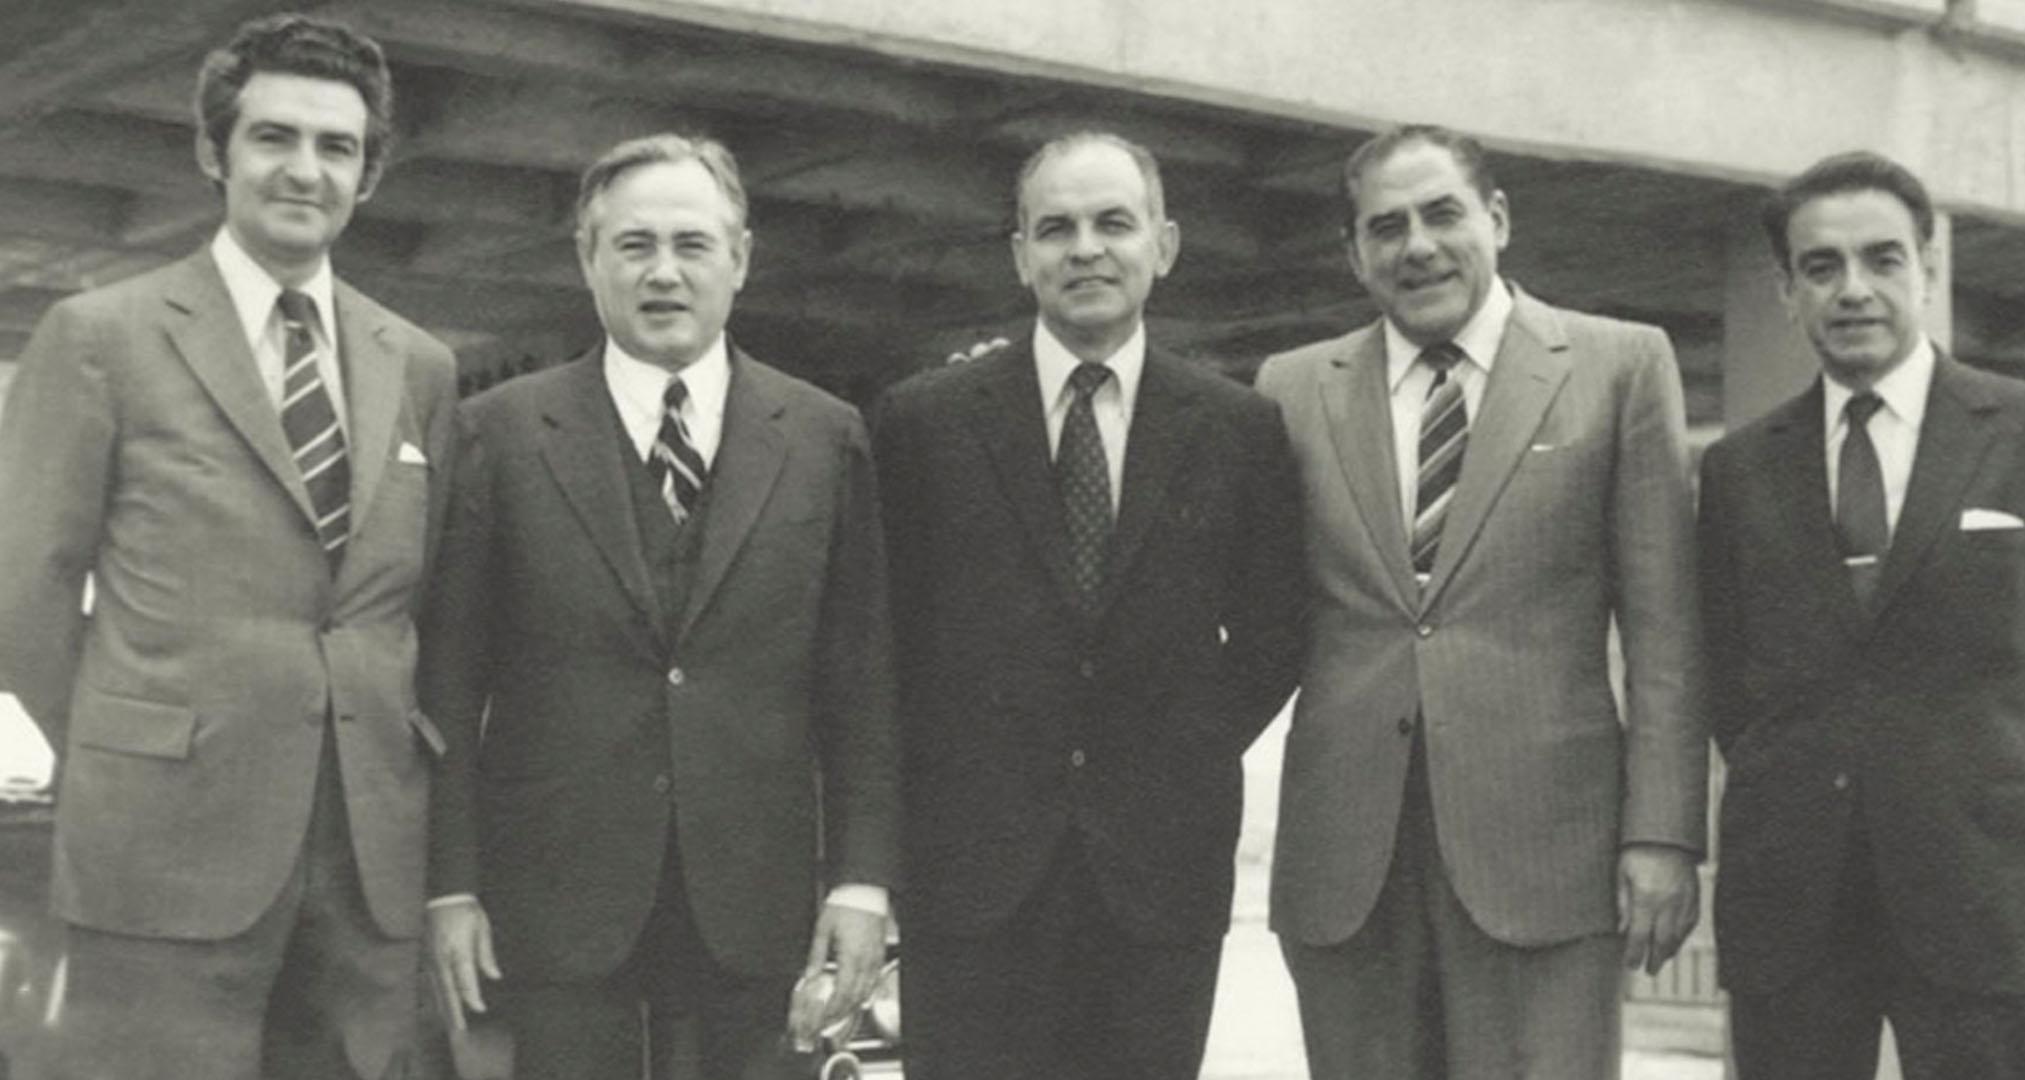 Fundadores de Bimbo. Roberto Servitje, Jaime Jorba, Lorenzo Servitje, Jaime Sendra y José T. Mata